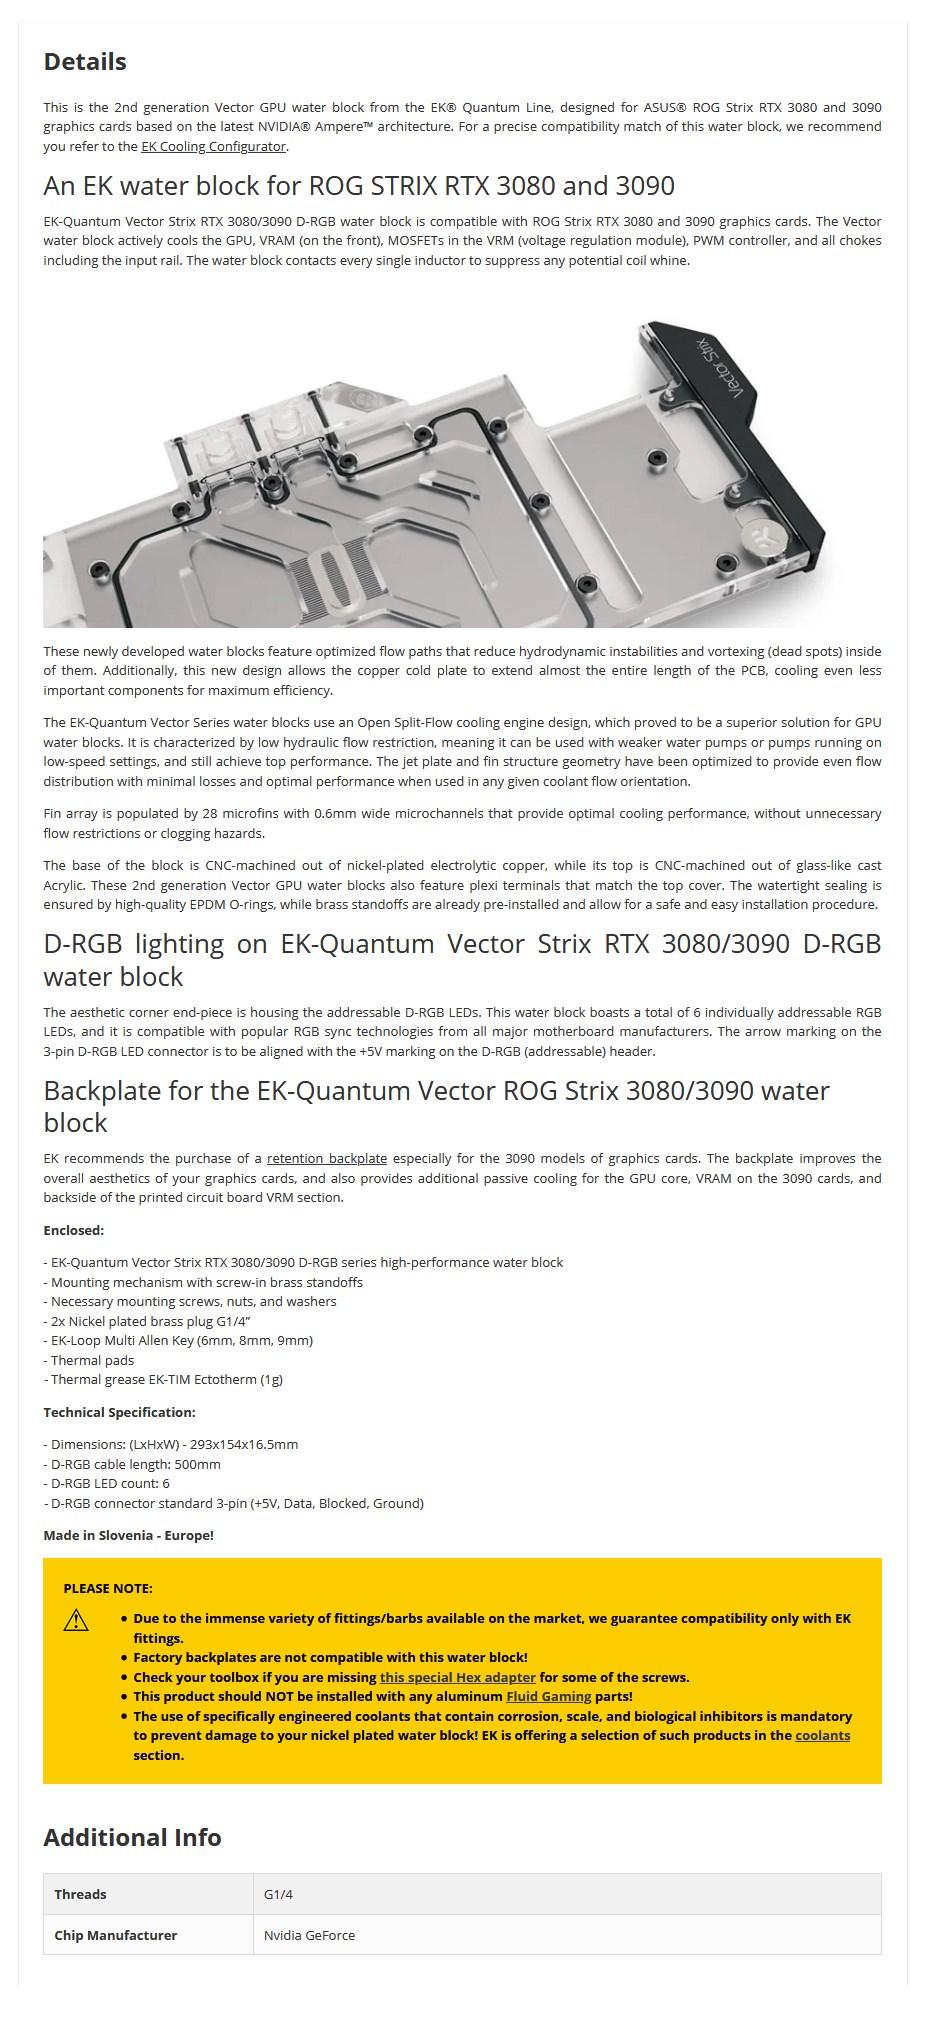 EKWB EK-Quantum Vector Strix RTX 3080/3090 D-RGB Nickel + Plexi GPU Water Block - Overview 1